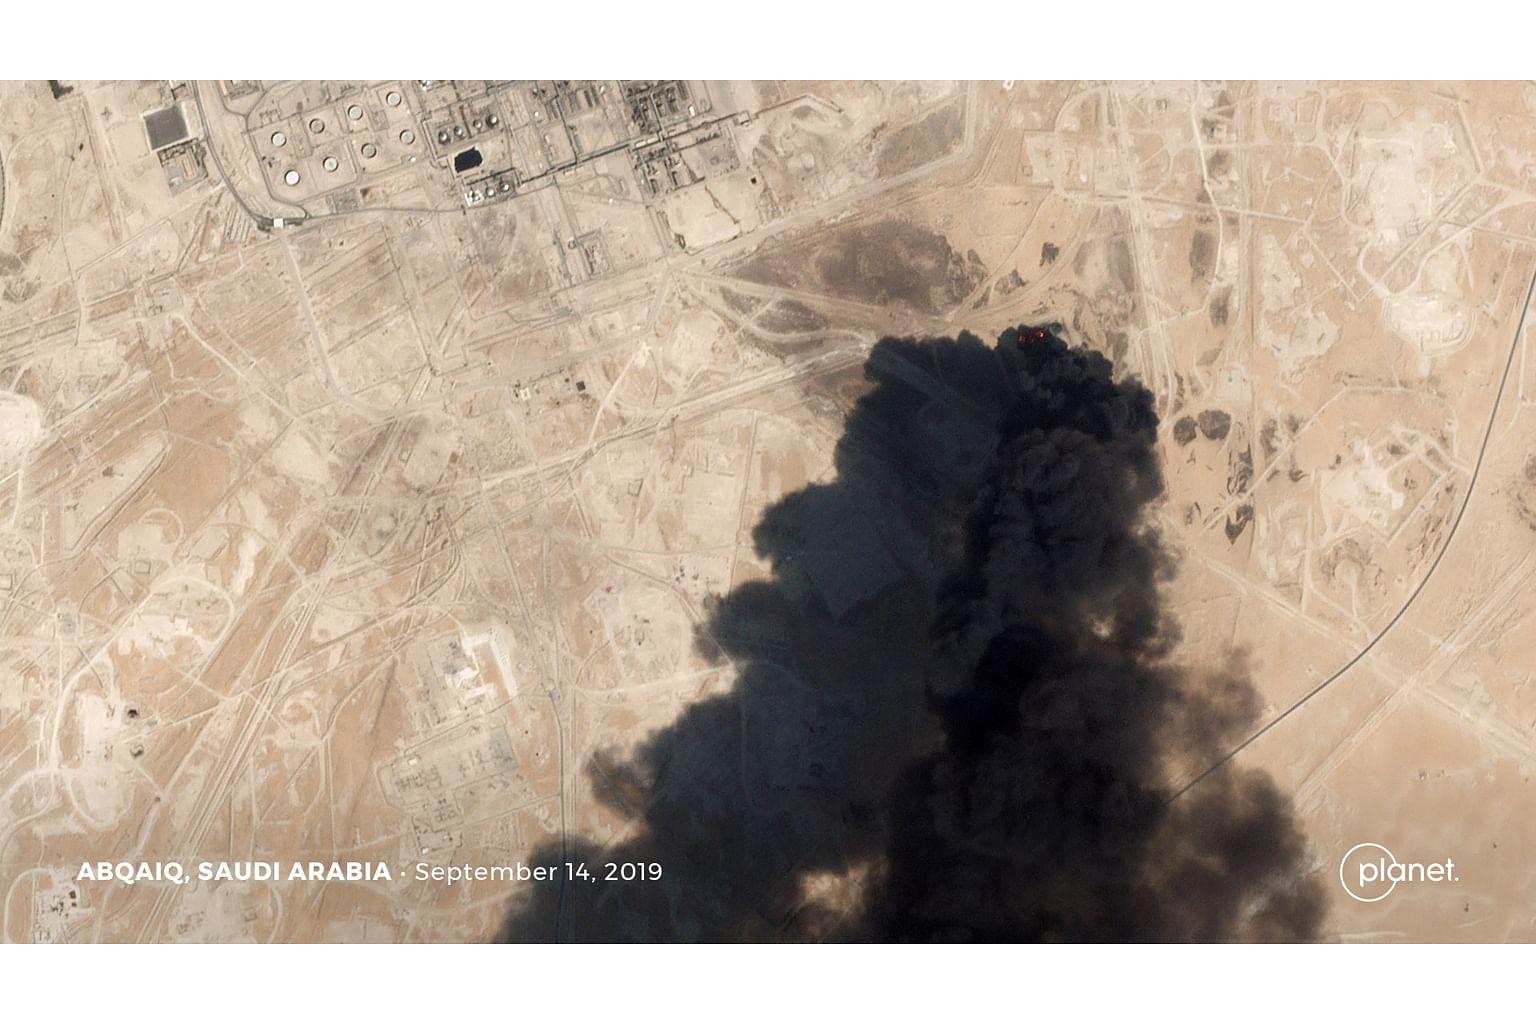 Harga minyak lonjak paras tertinggi dek serangan loji minyak Saudi